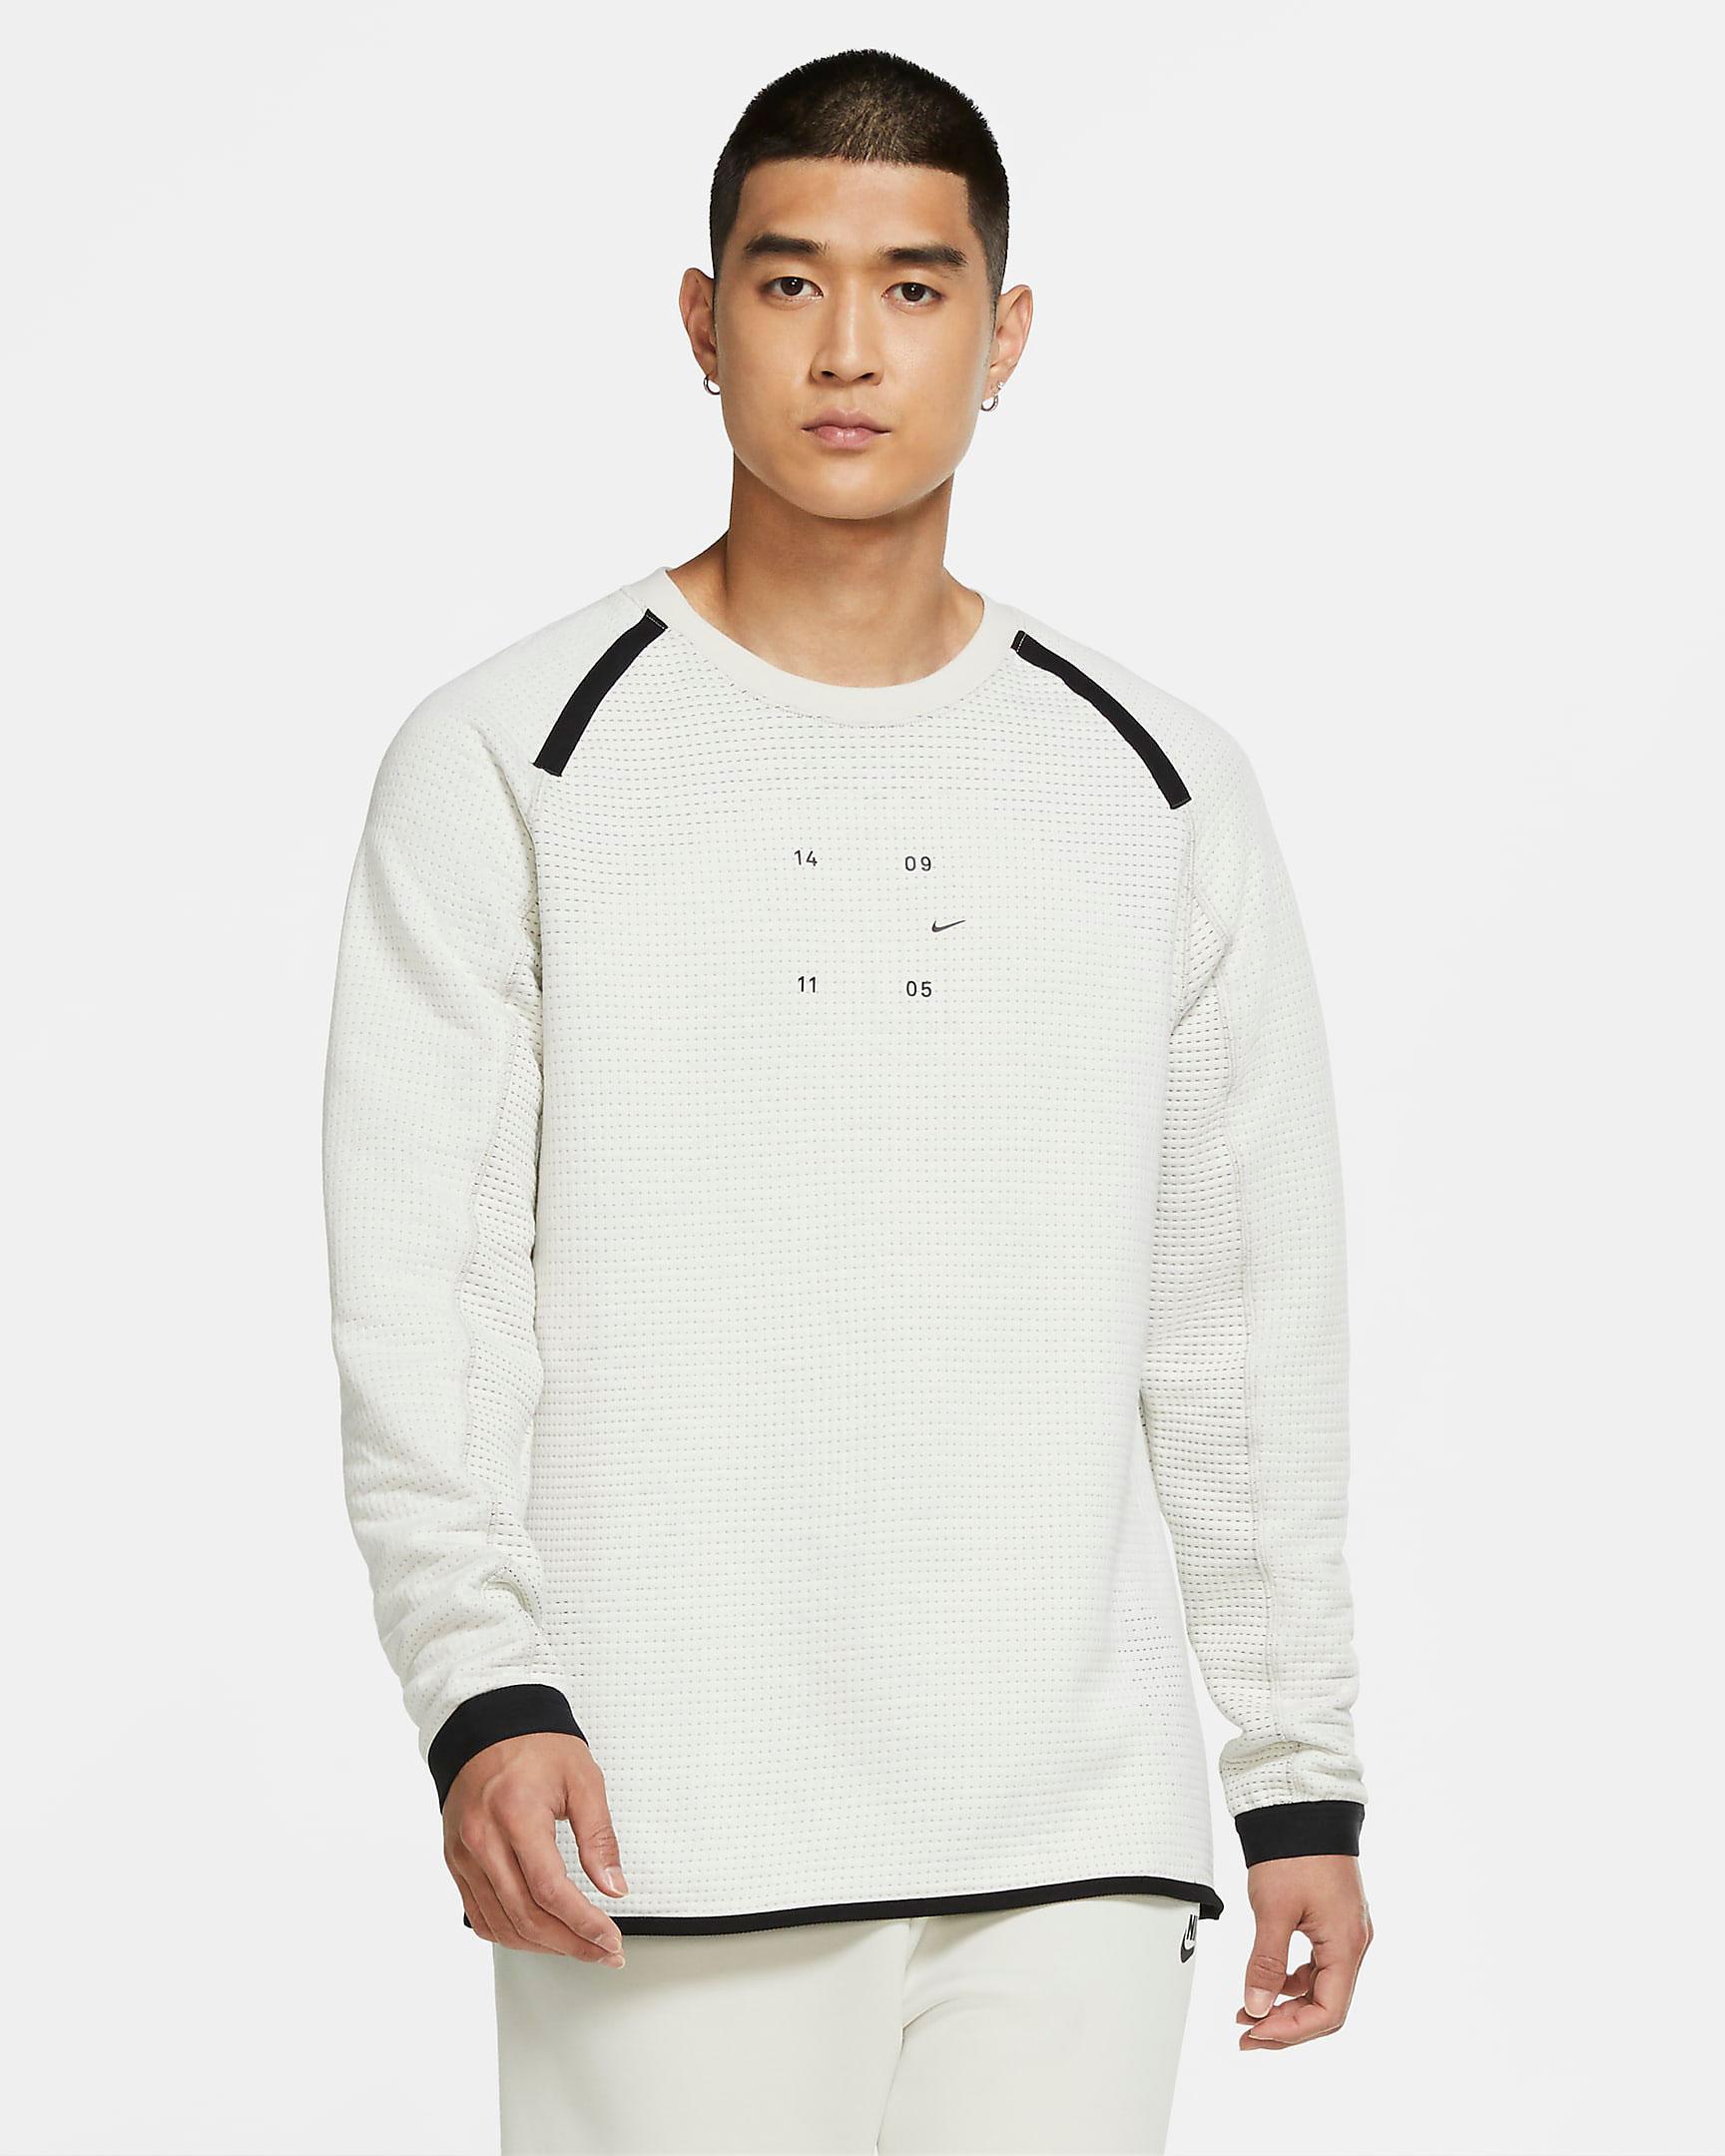 off-white-air-jordan-5-sail-nike-crew-sweatshirt-match